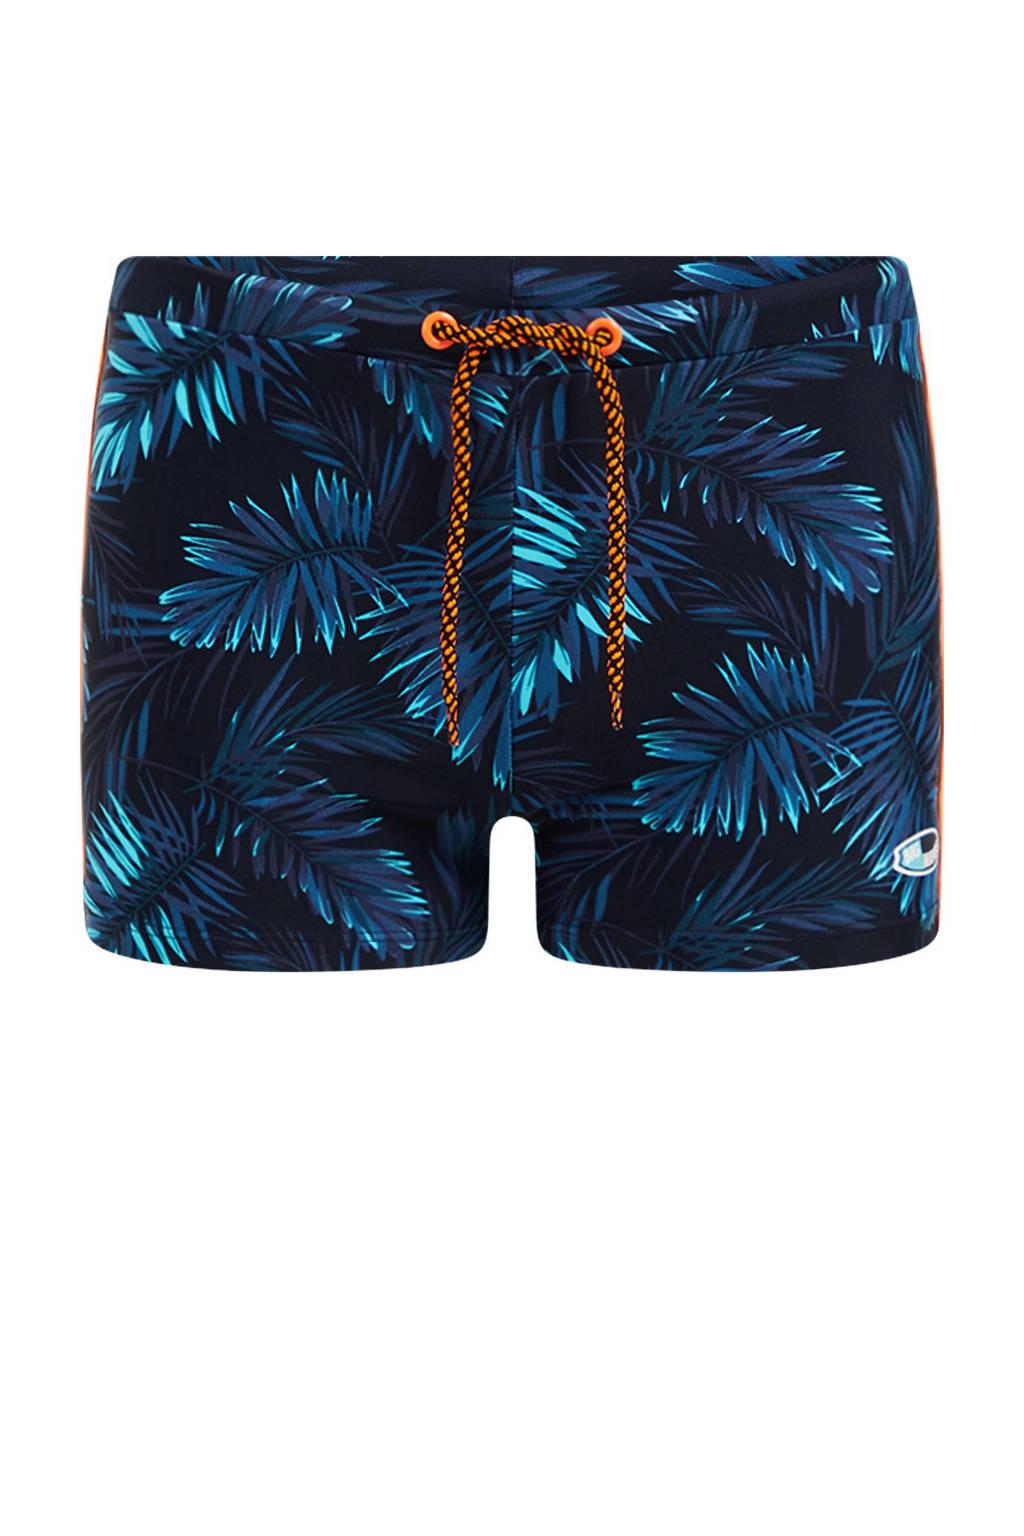 WE Fashion zwemboxer met blad rpint donkerblauw, Donkerblauw